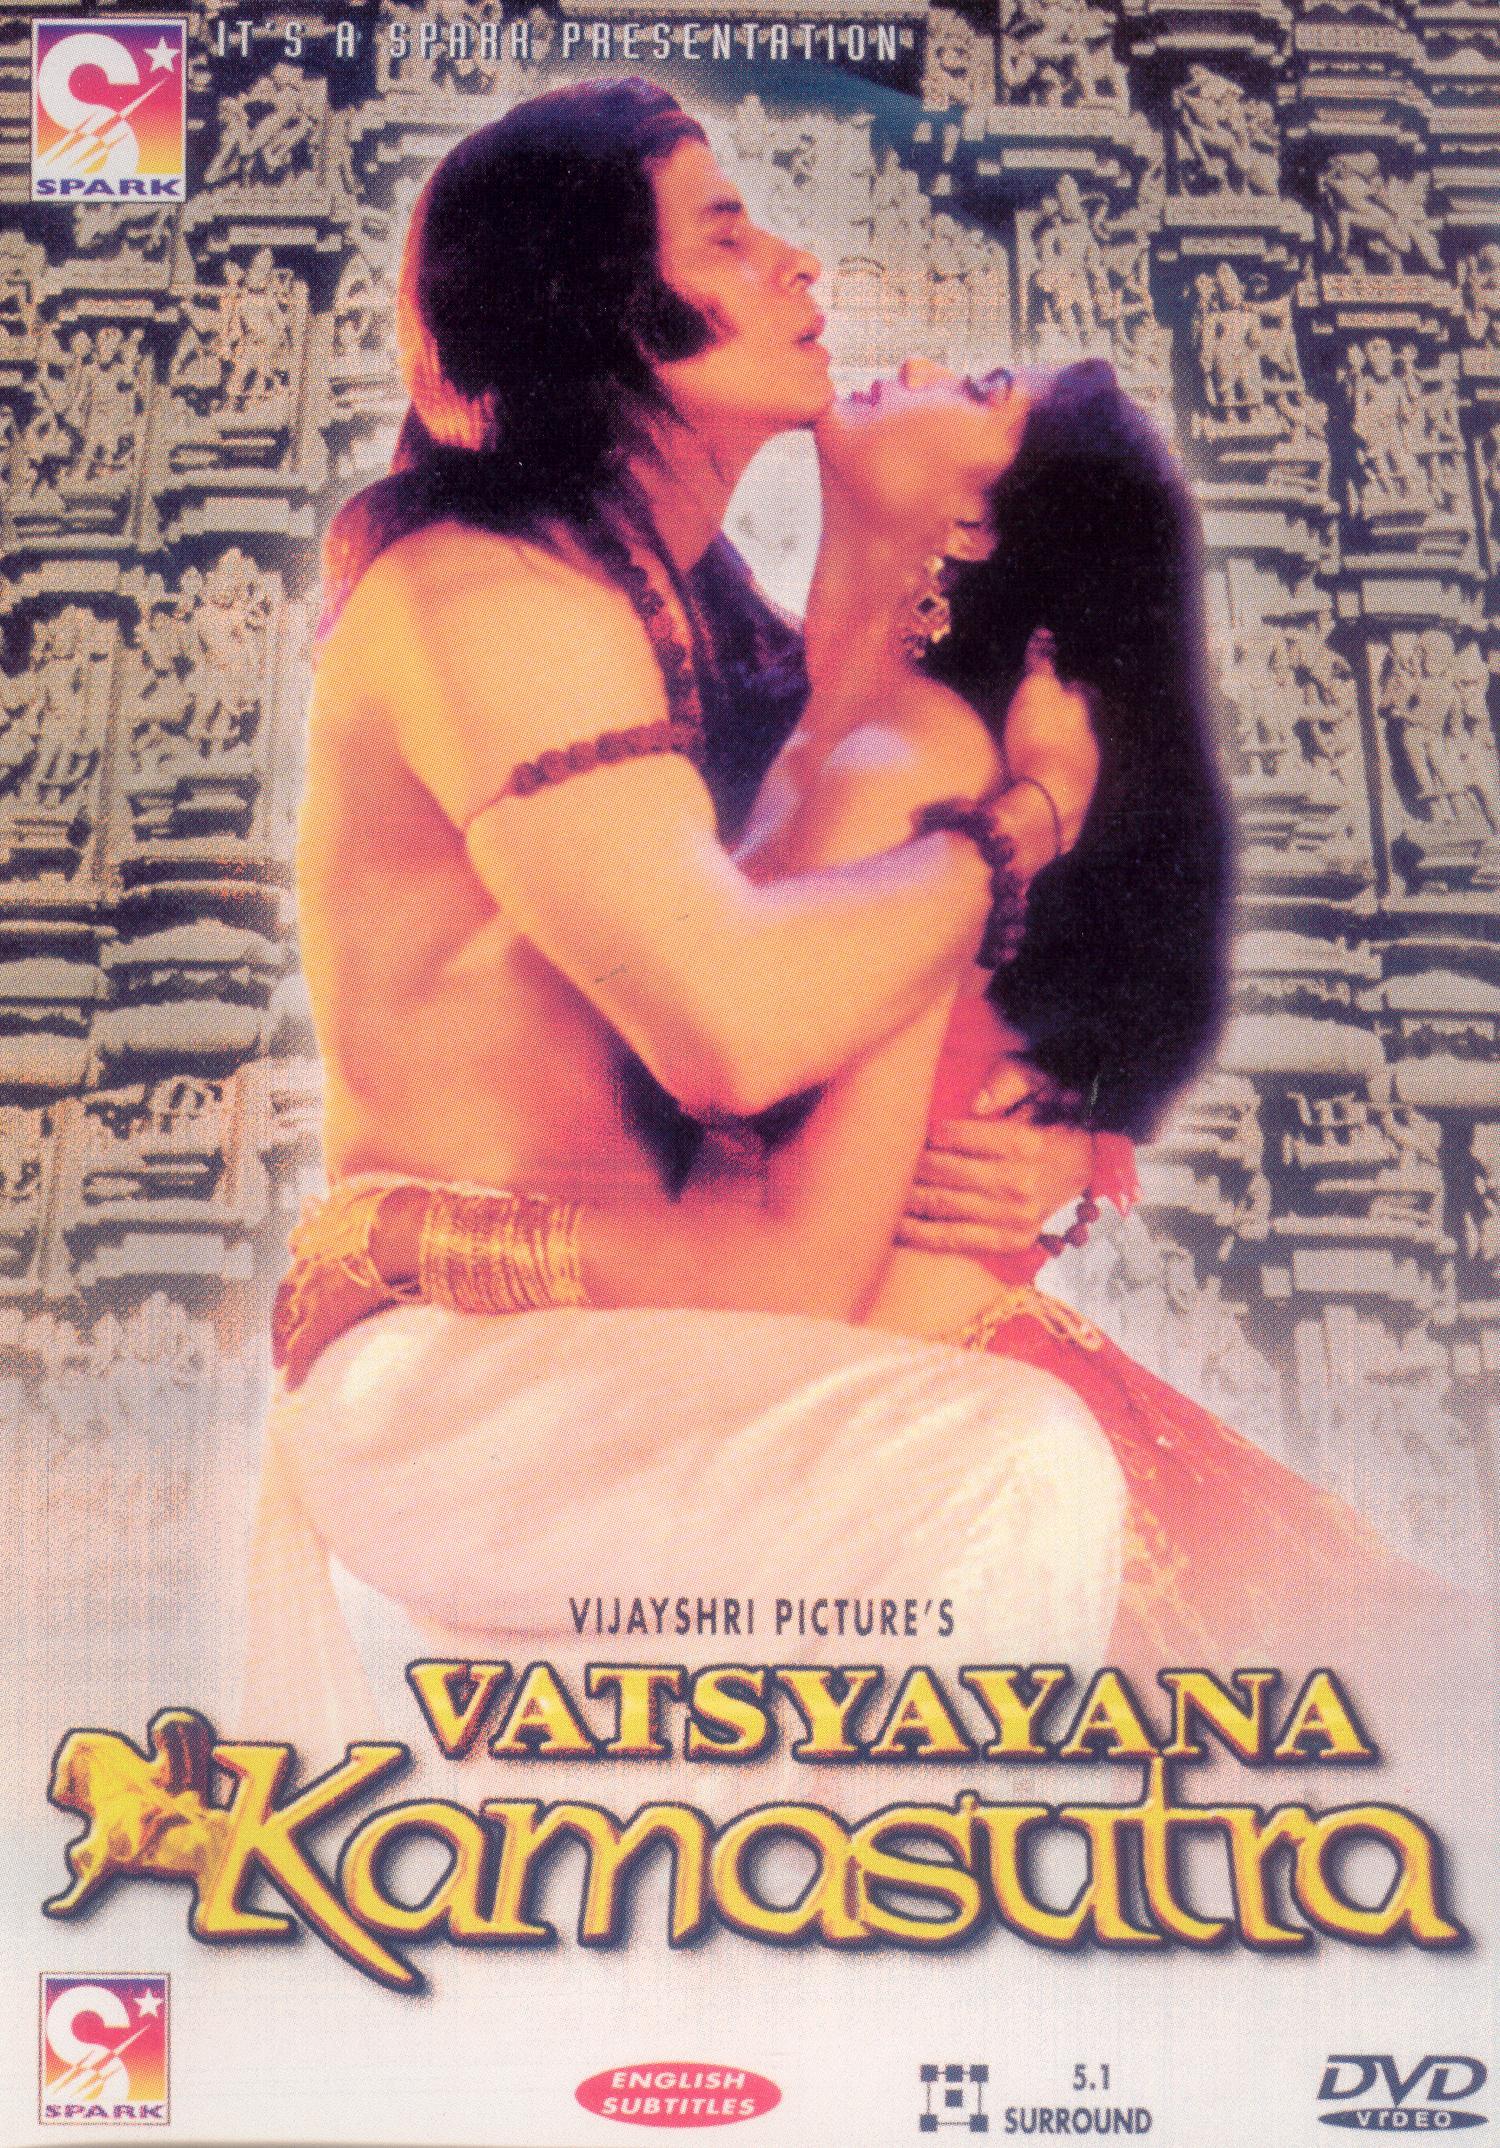 Vatsyayana Kamasutra